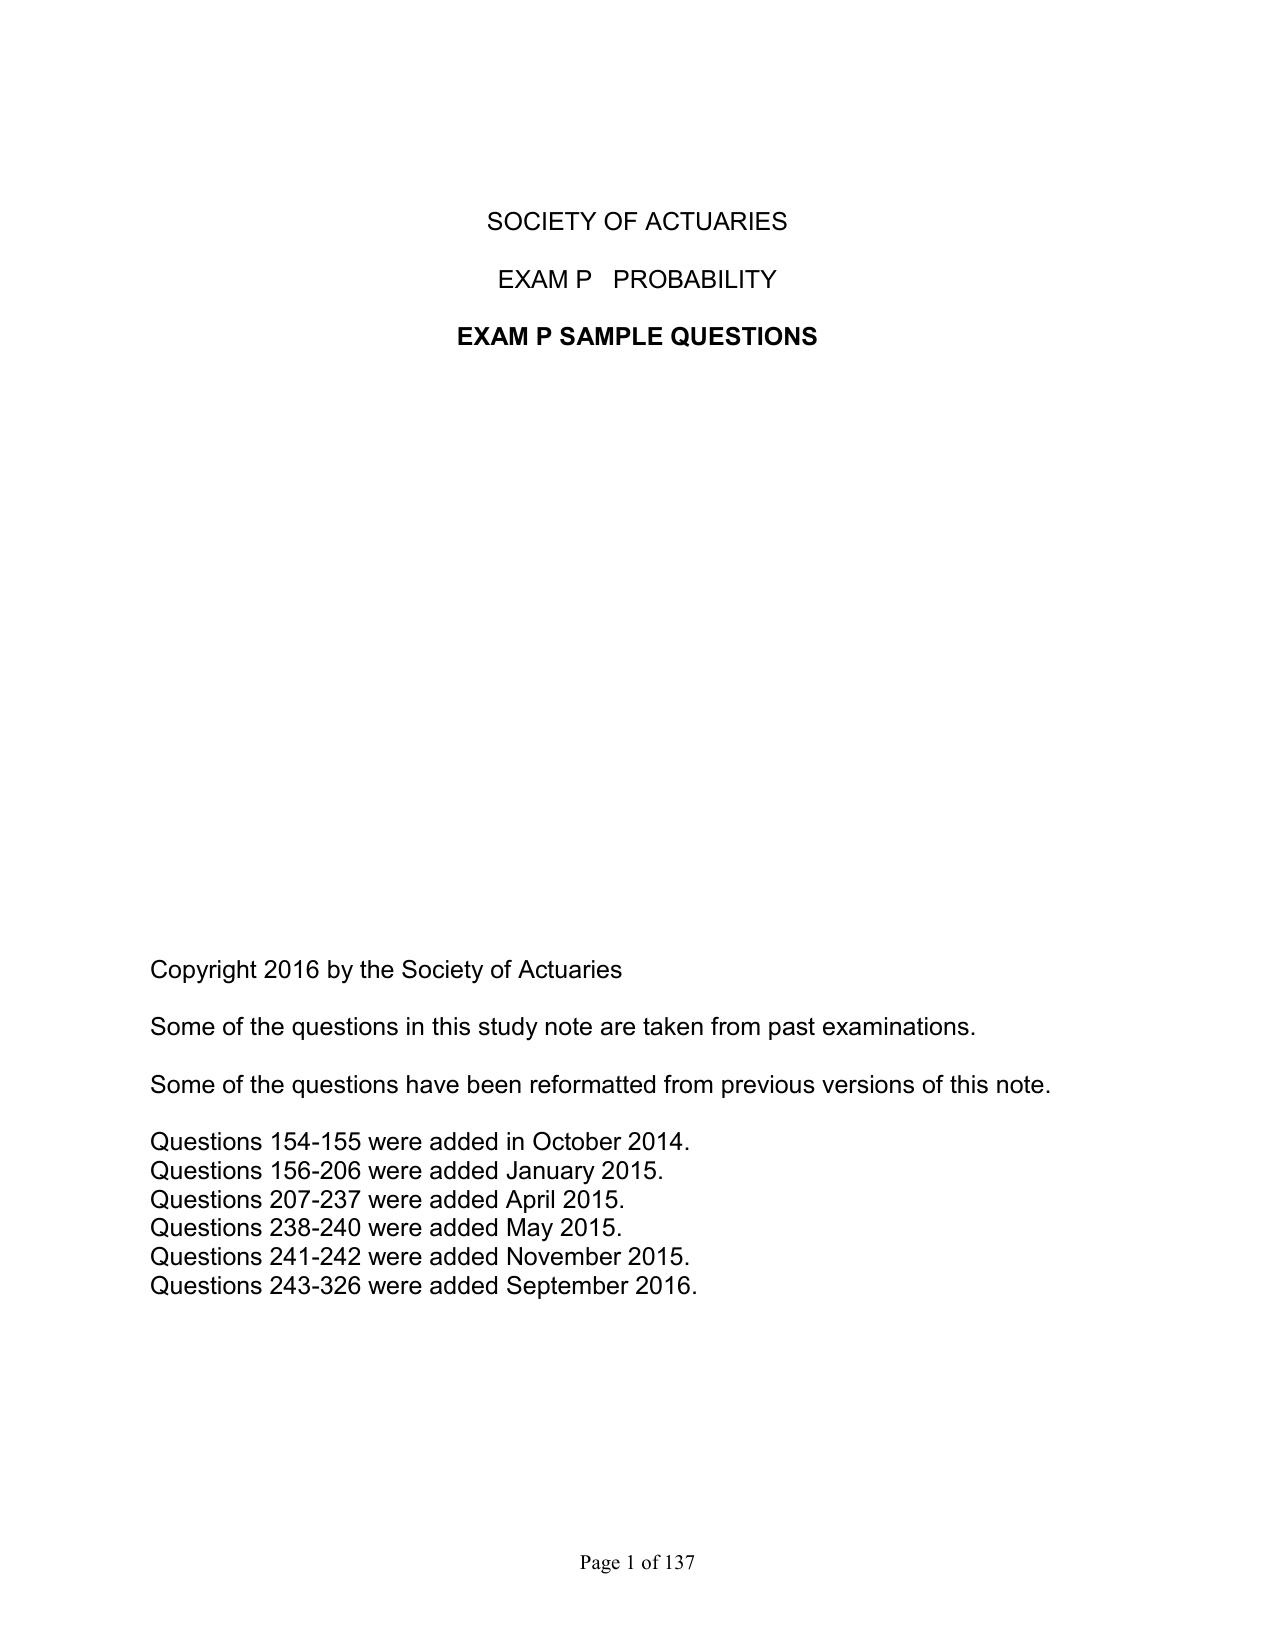 Guo's original problem for actuarial exam p - sample youtube.